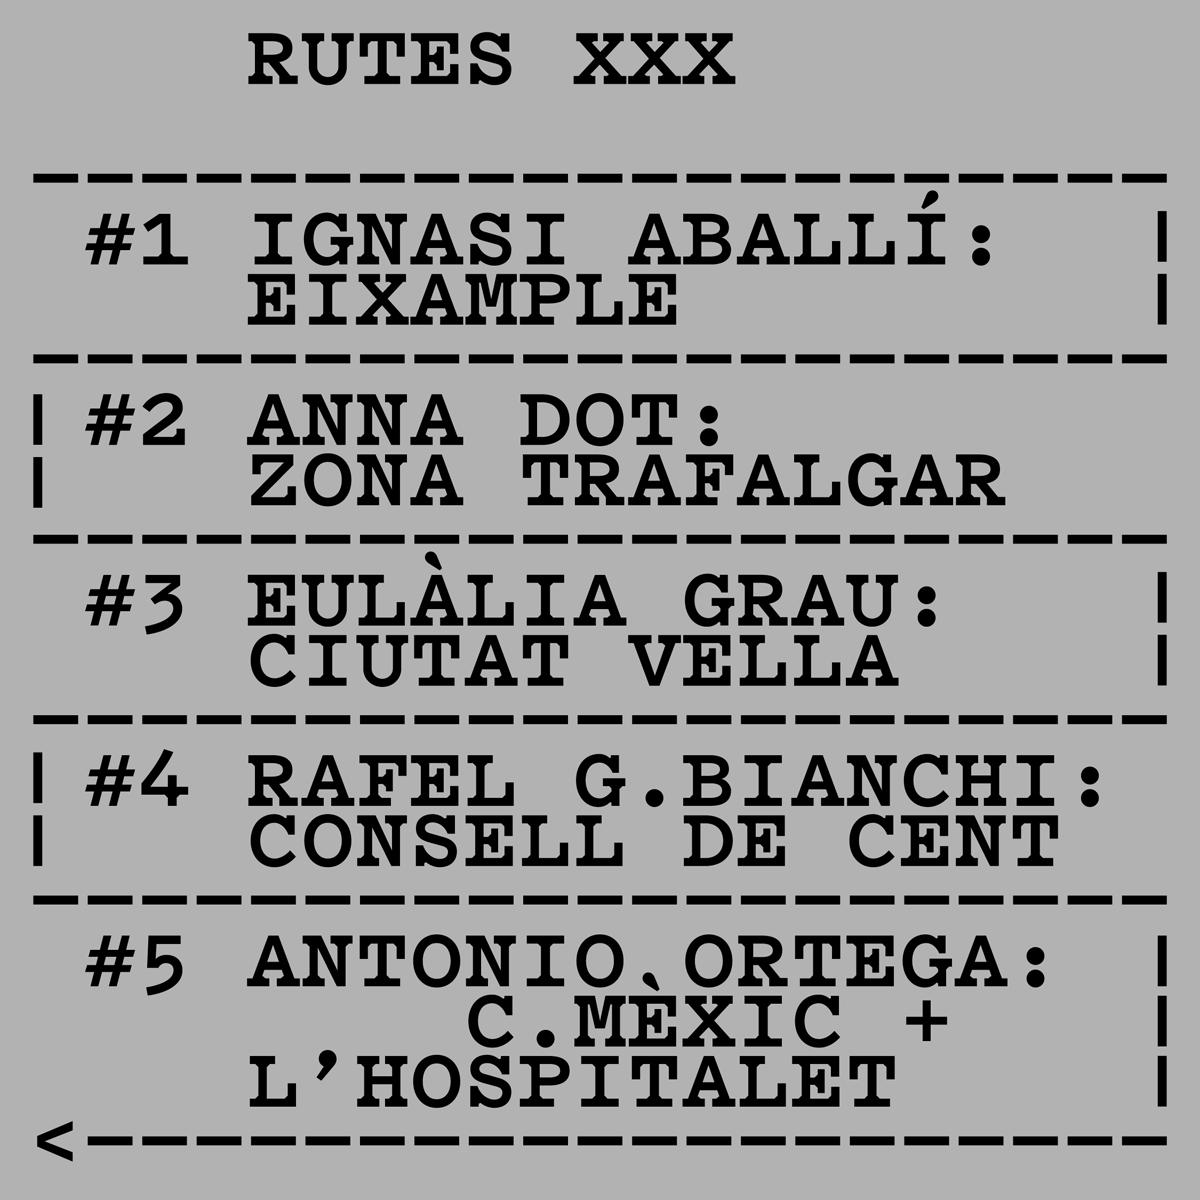 RUTES XXX. Ignasi Aballí, Anna Dot, Eulàlia Grau, Rafel G. Bianchi, Antonio Ortega